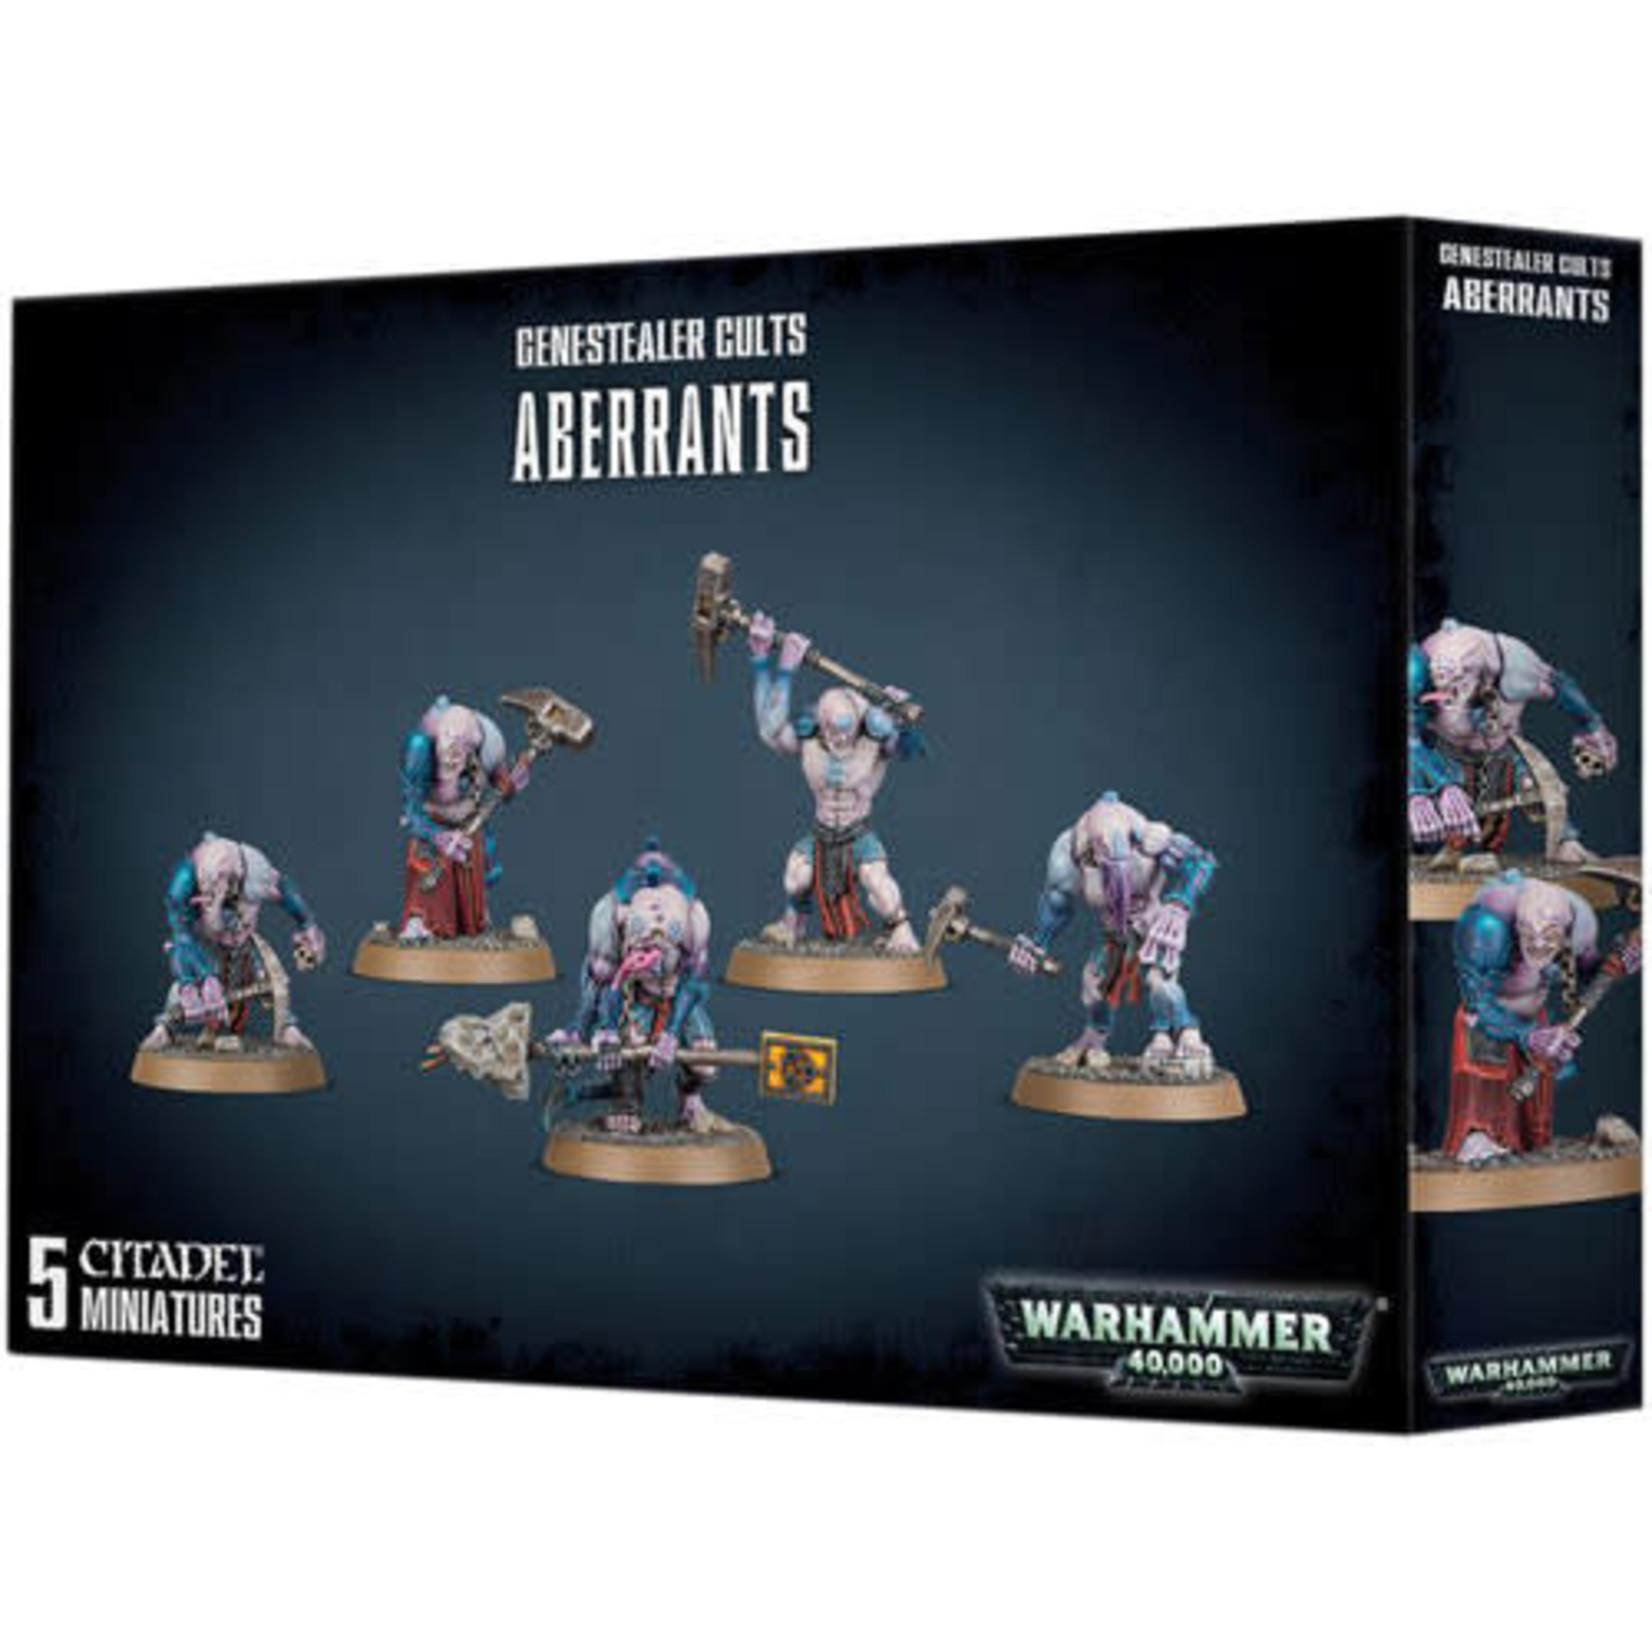 Games Workshop Warhammer 40k: Genestealer Cults - Aberrants